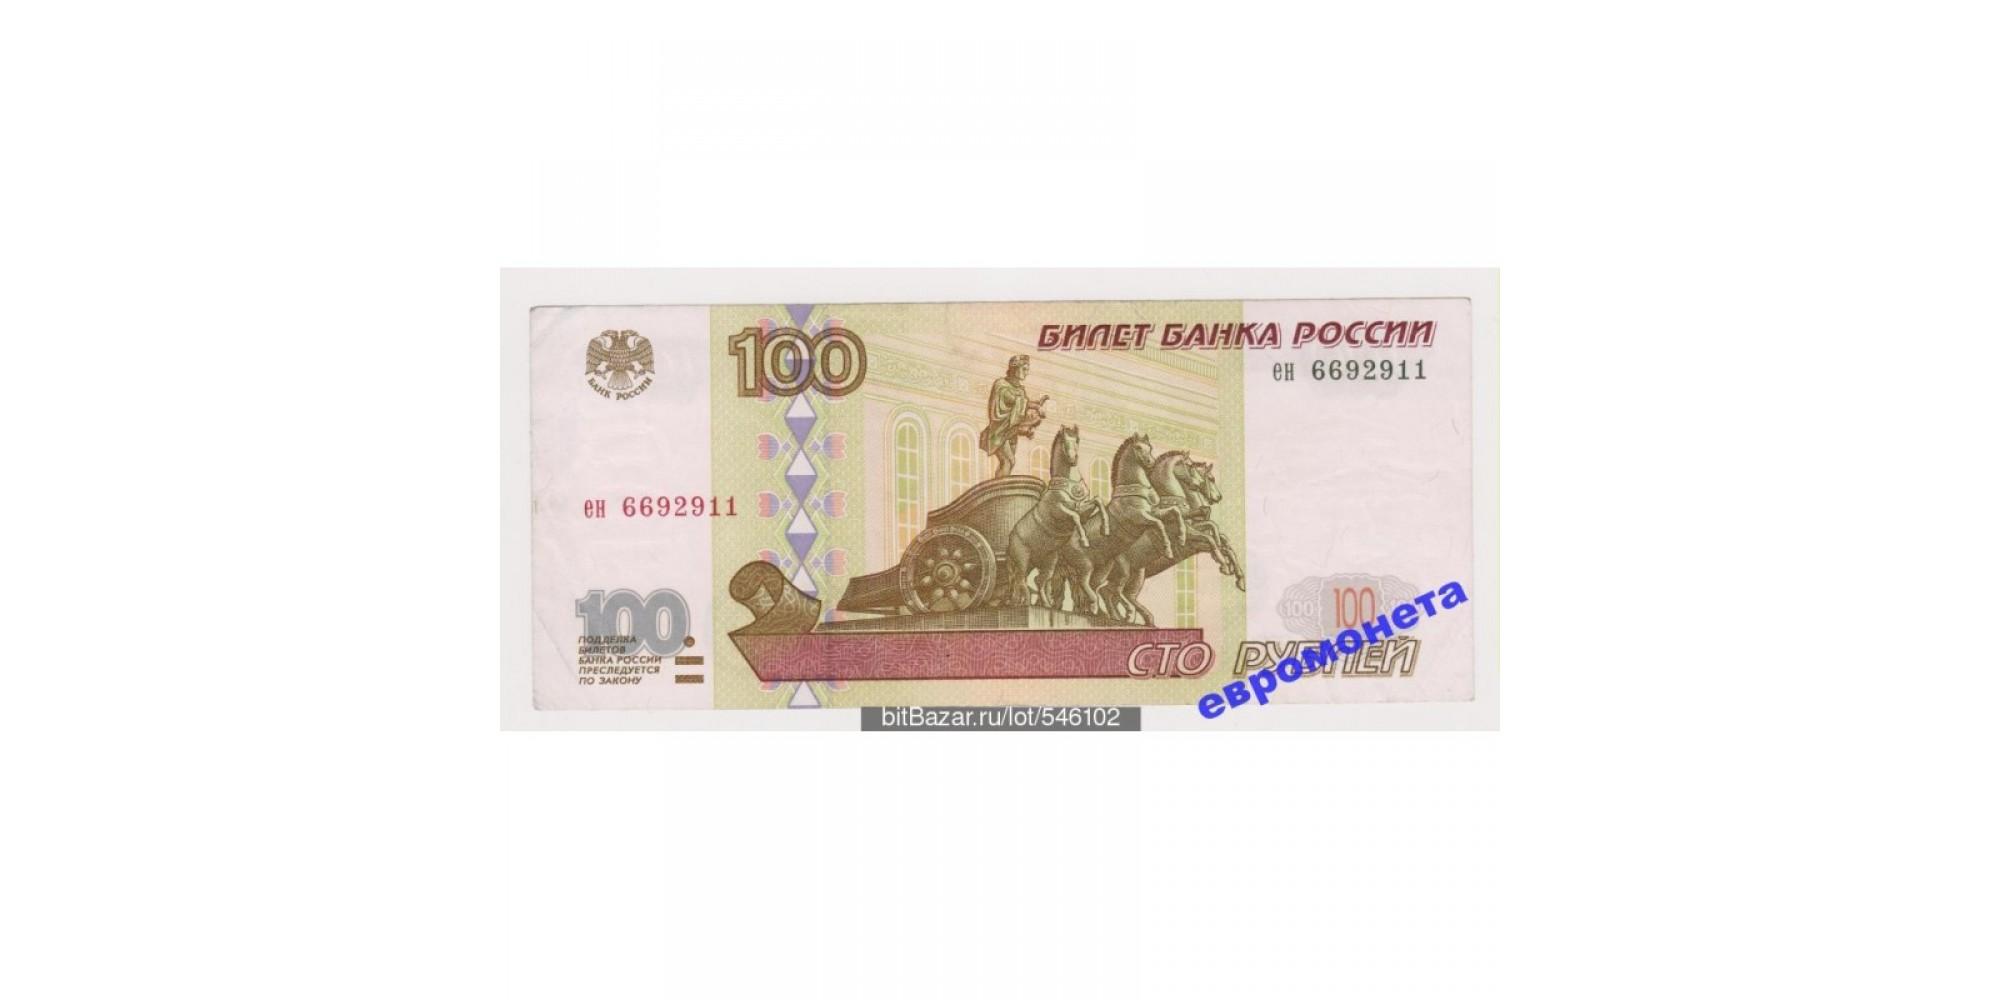 Россия 100 рублей 1997 год без модификации серия ен 6692911